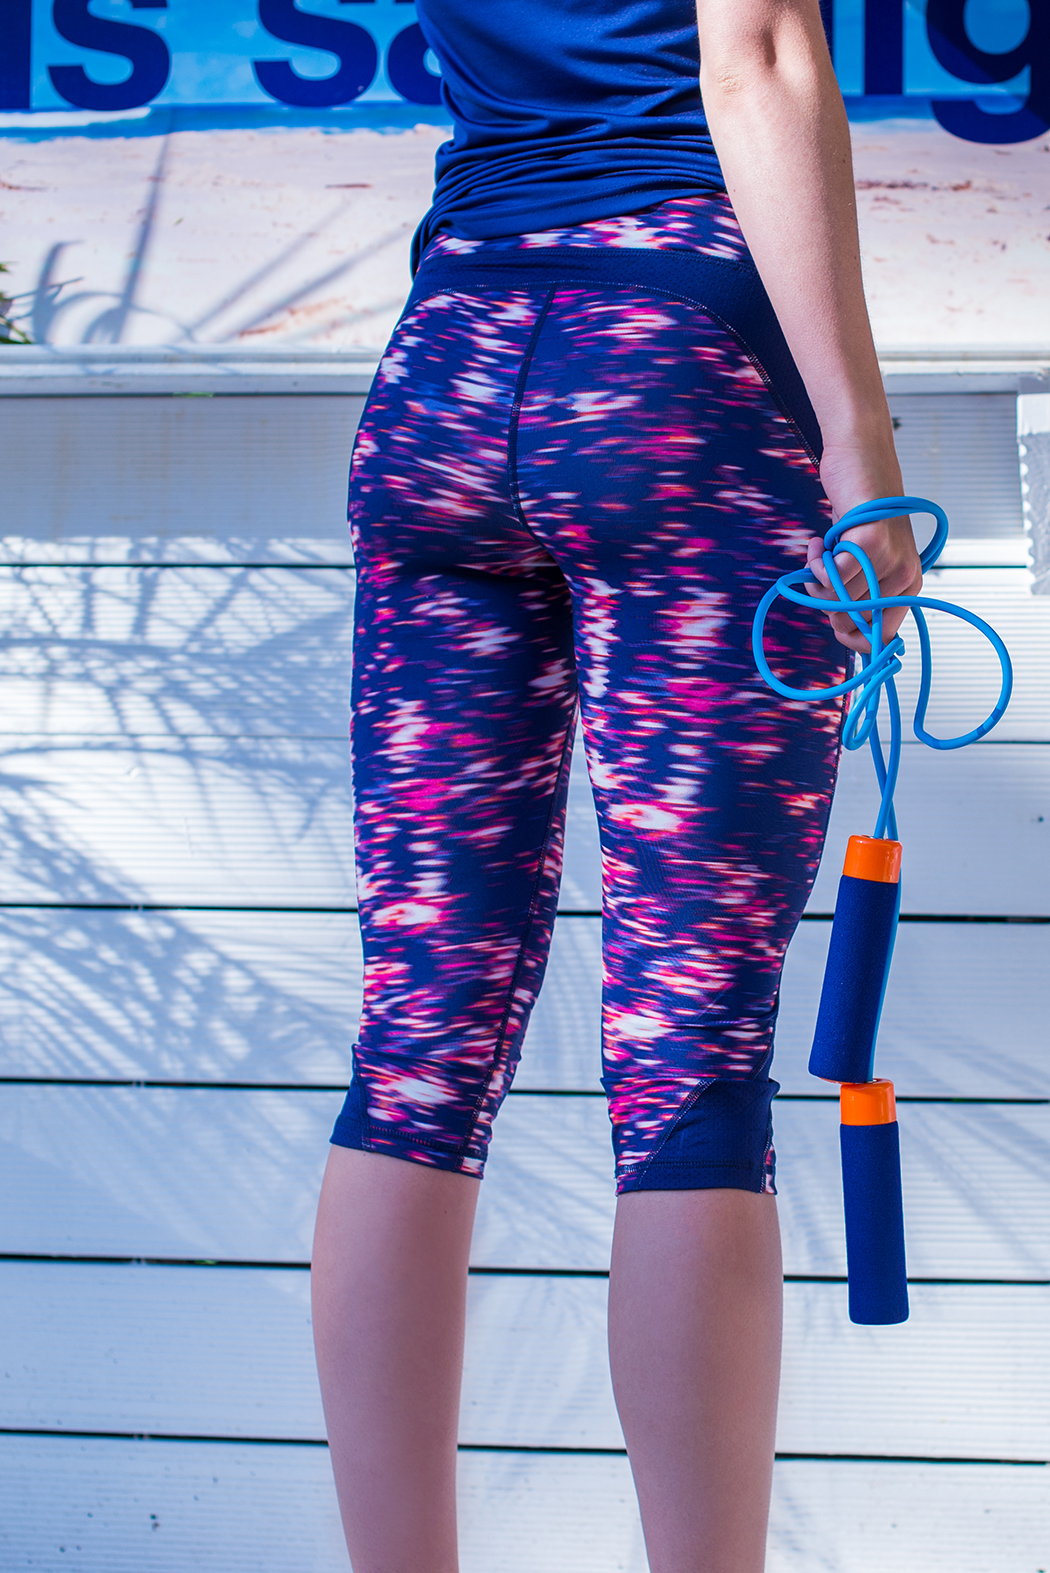 Fitnessblog-Fitnessblogger-Fitness-Blog-Blogger-Sport-Tchibo-Yoga-Wochenwelt-Lindarella-Linda-7